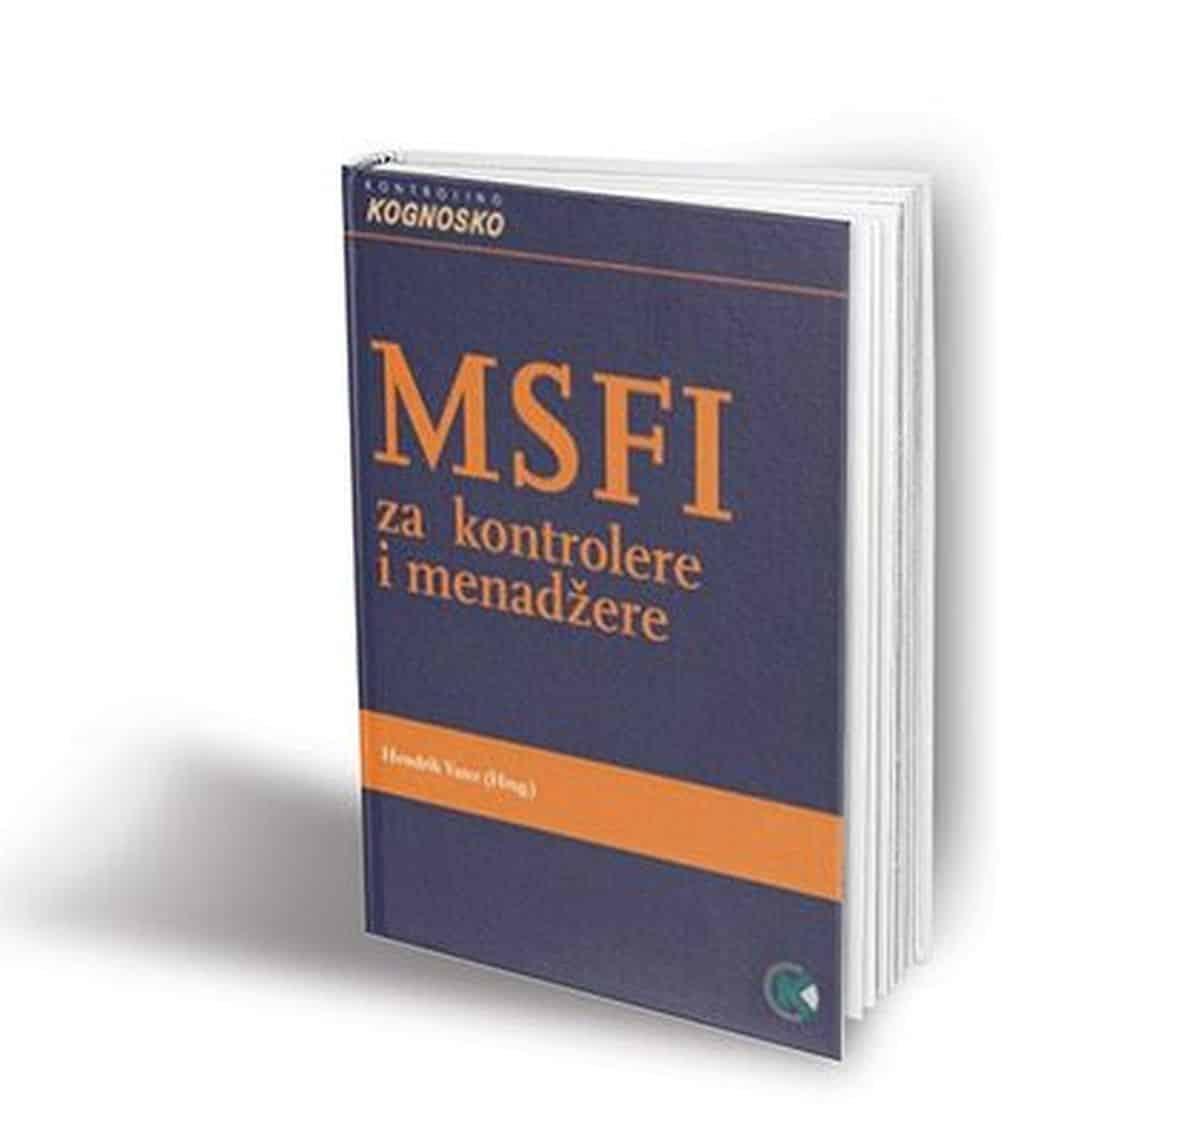 Kognosko MSFI za kontrolere